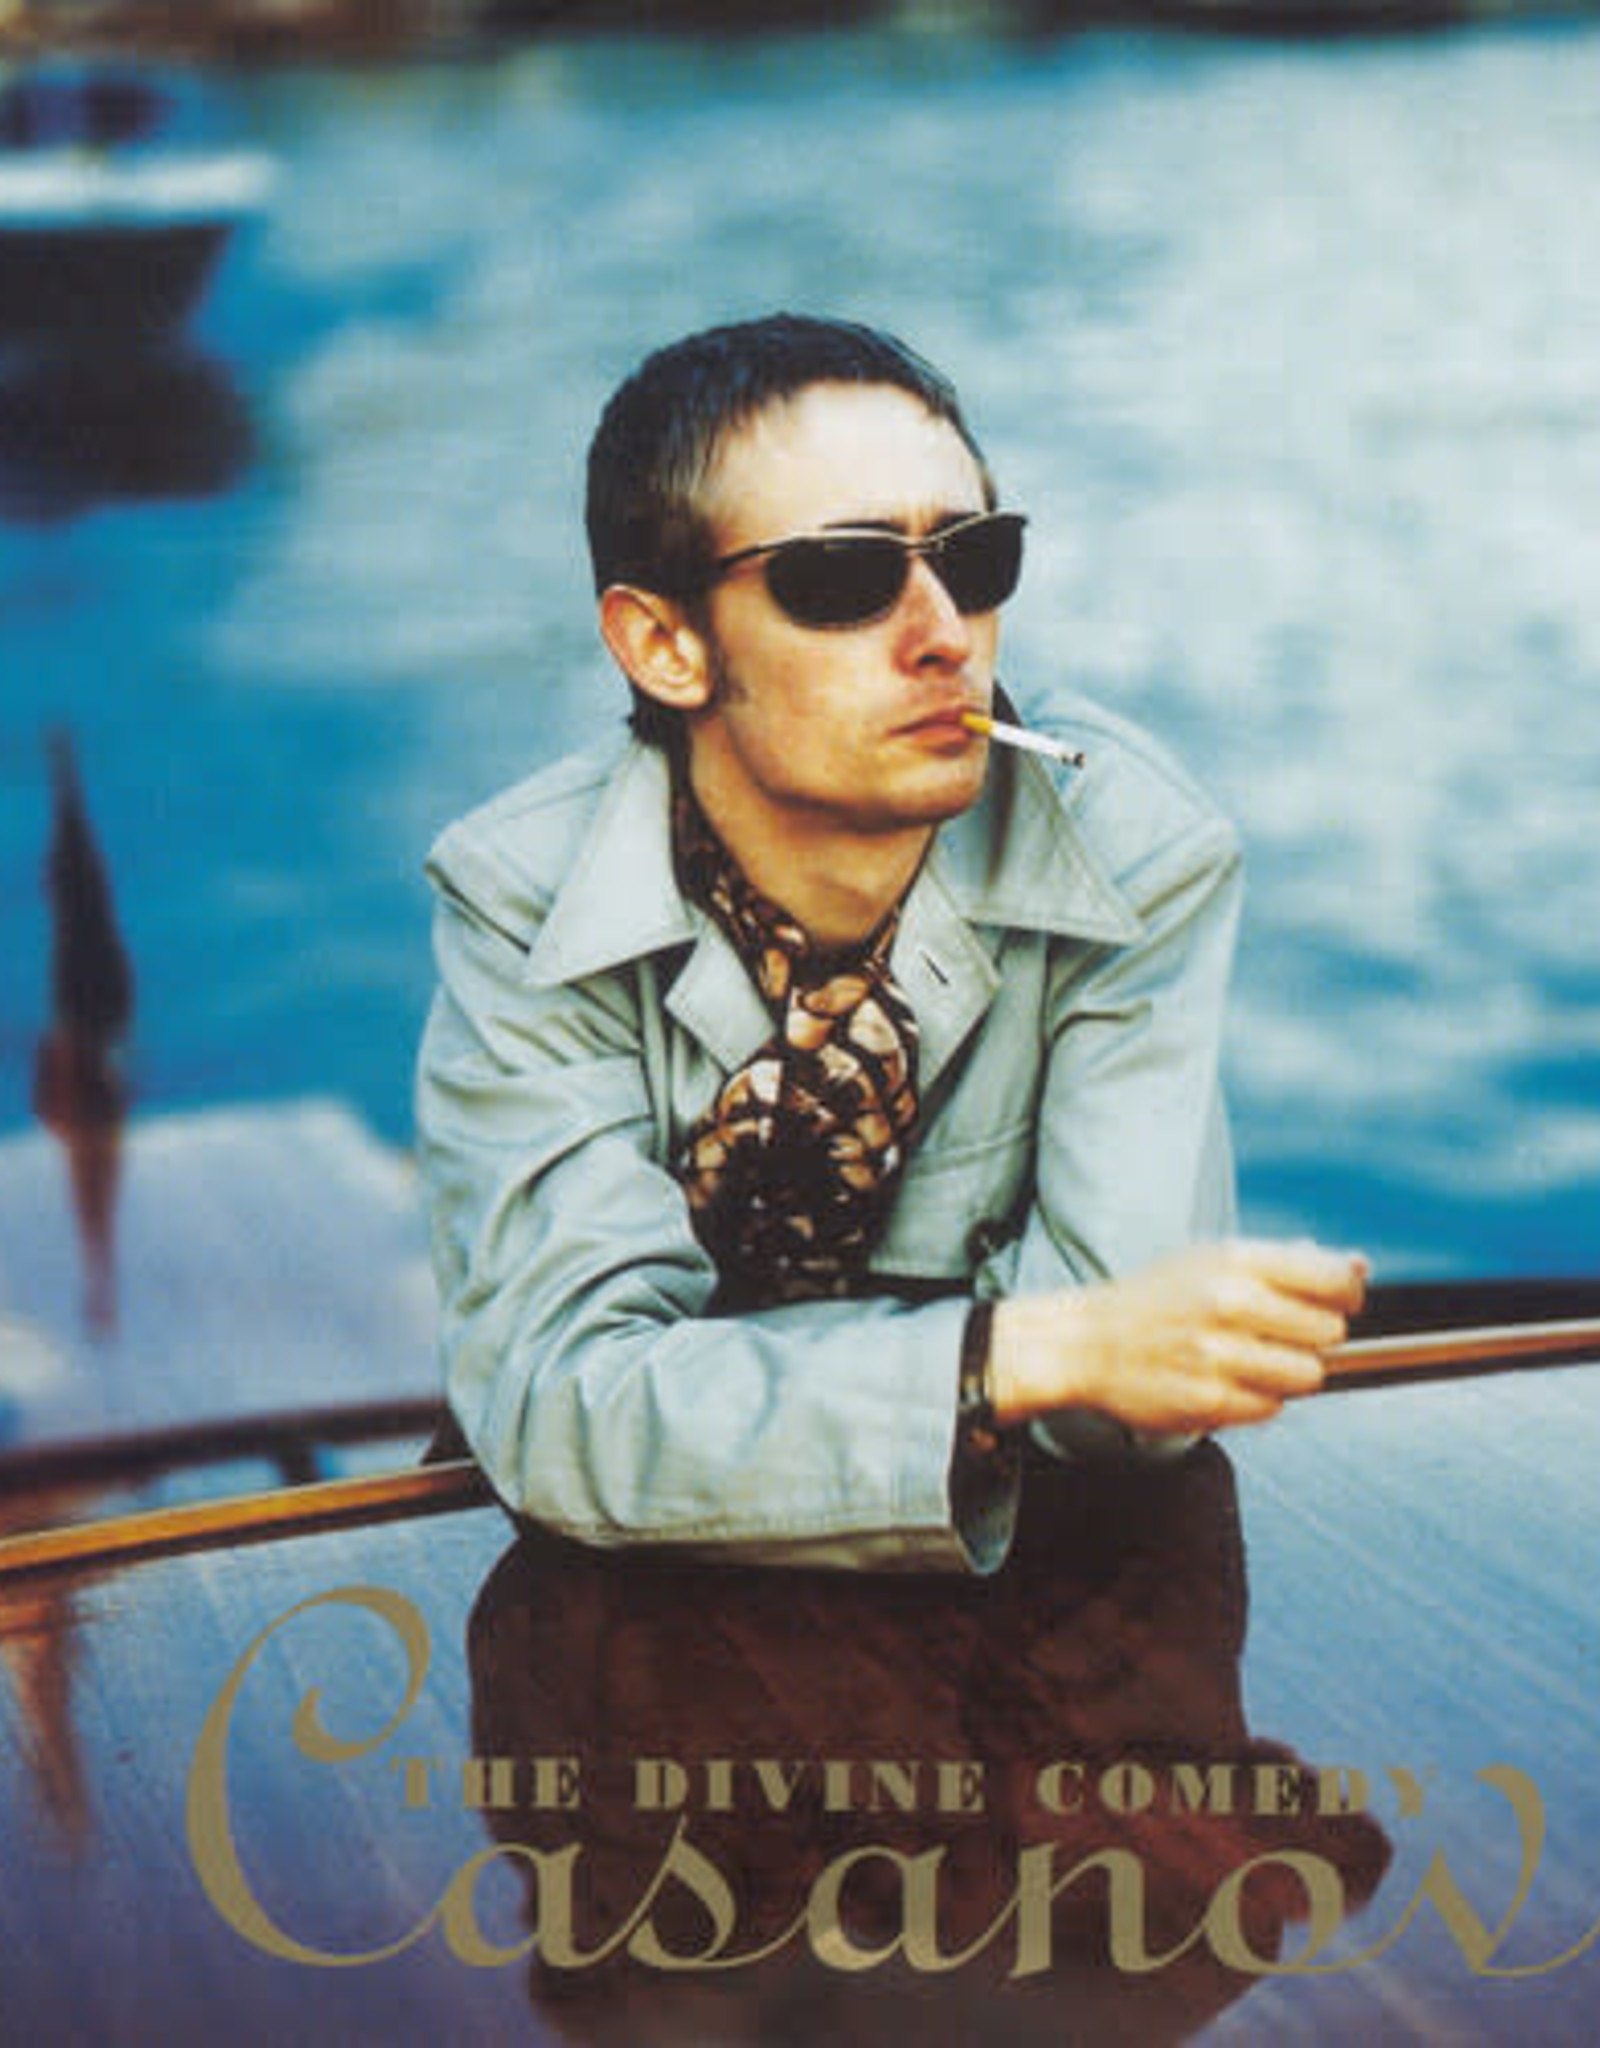 Divine Comedy - Casanova